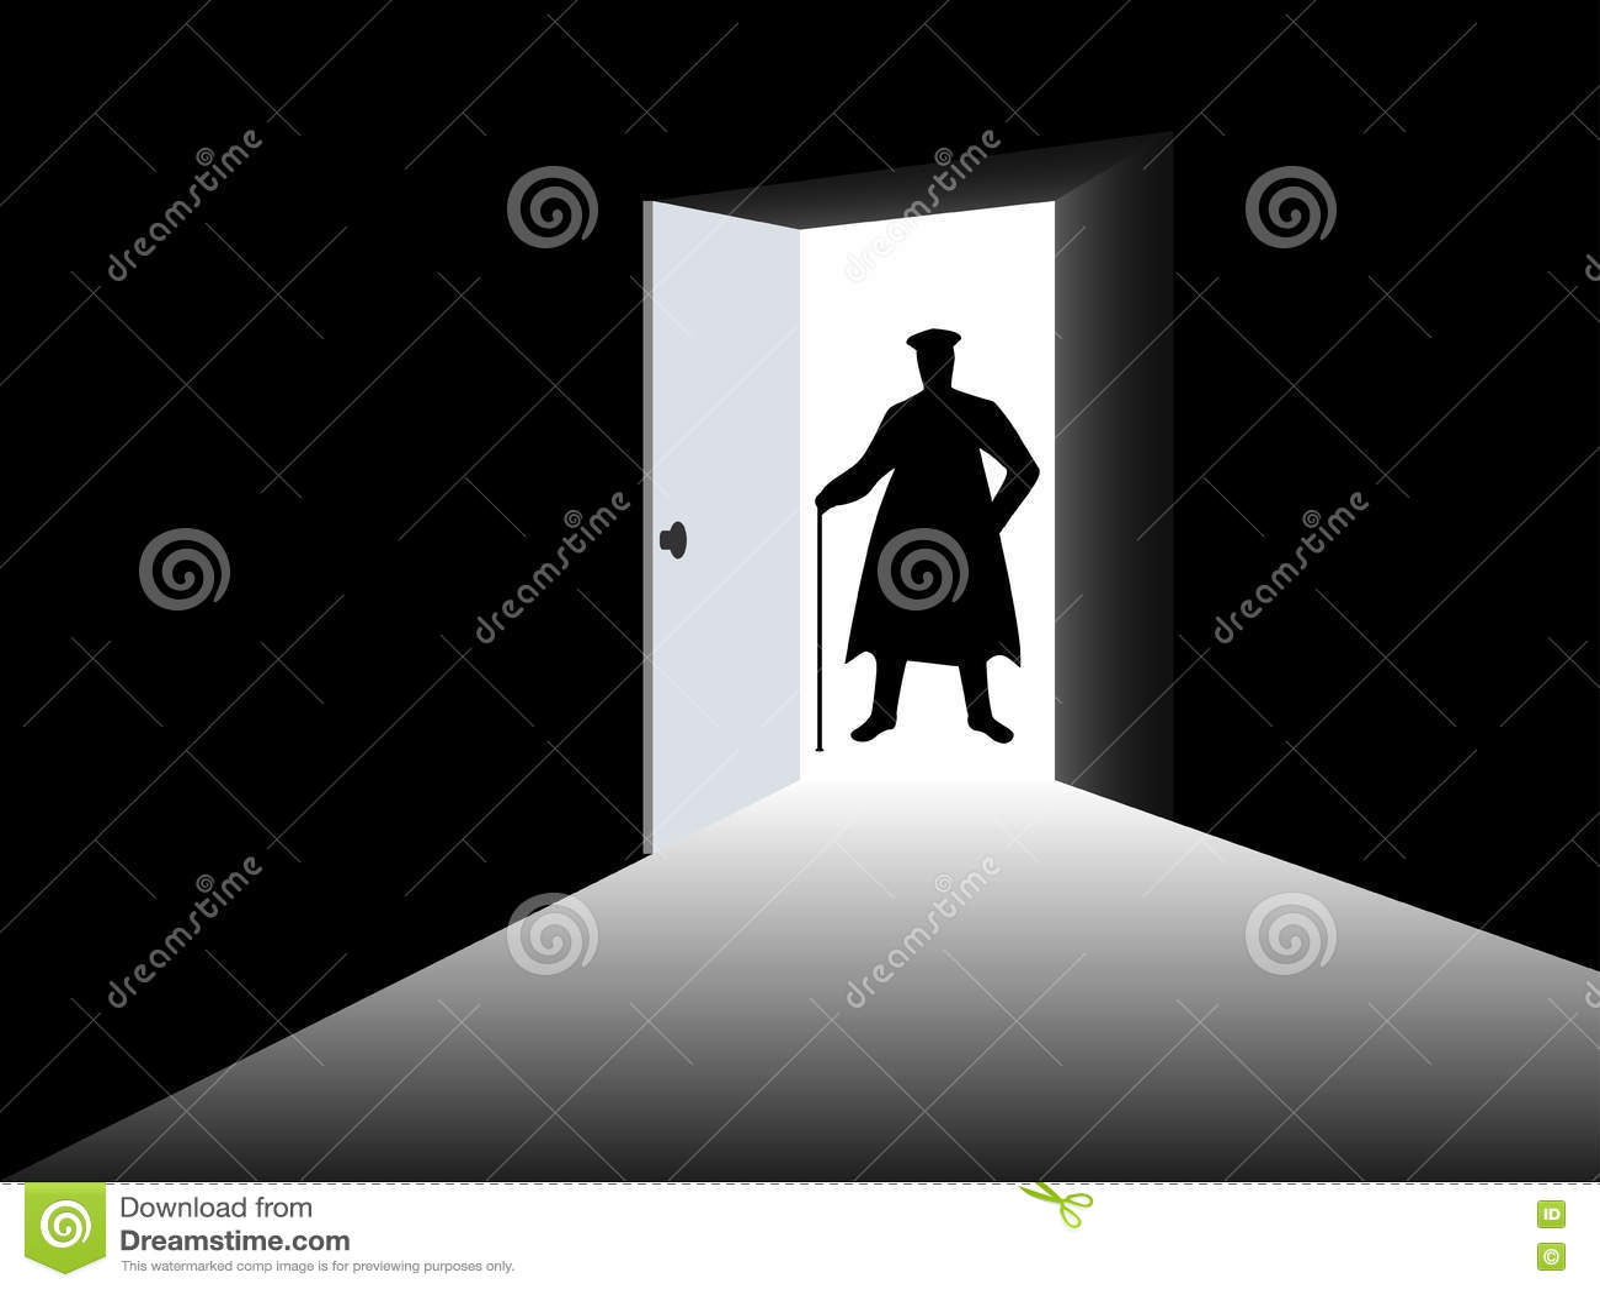 Open Door Dark Room silhouette of a man in a cloak in the open door. a man with a cane